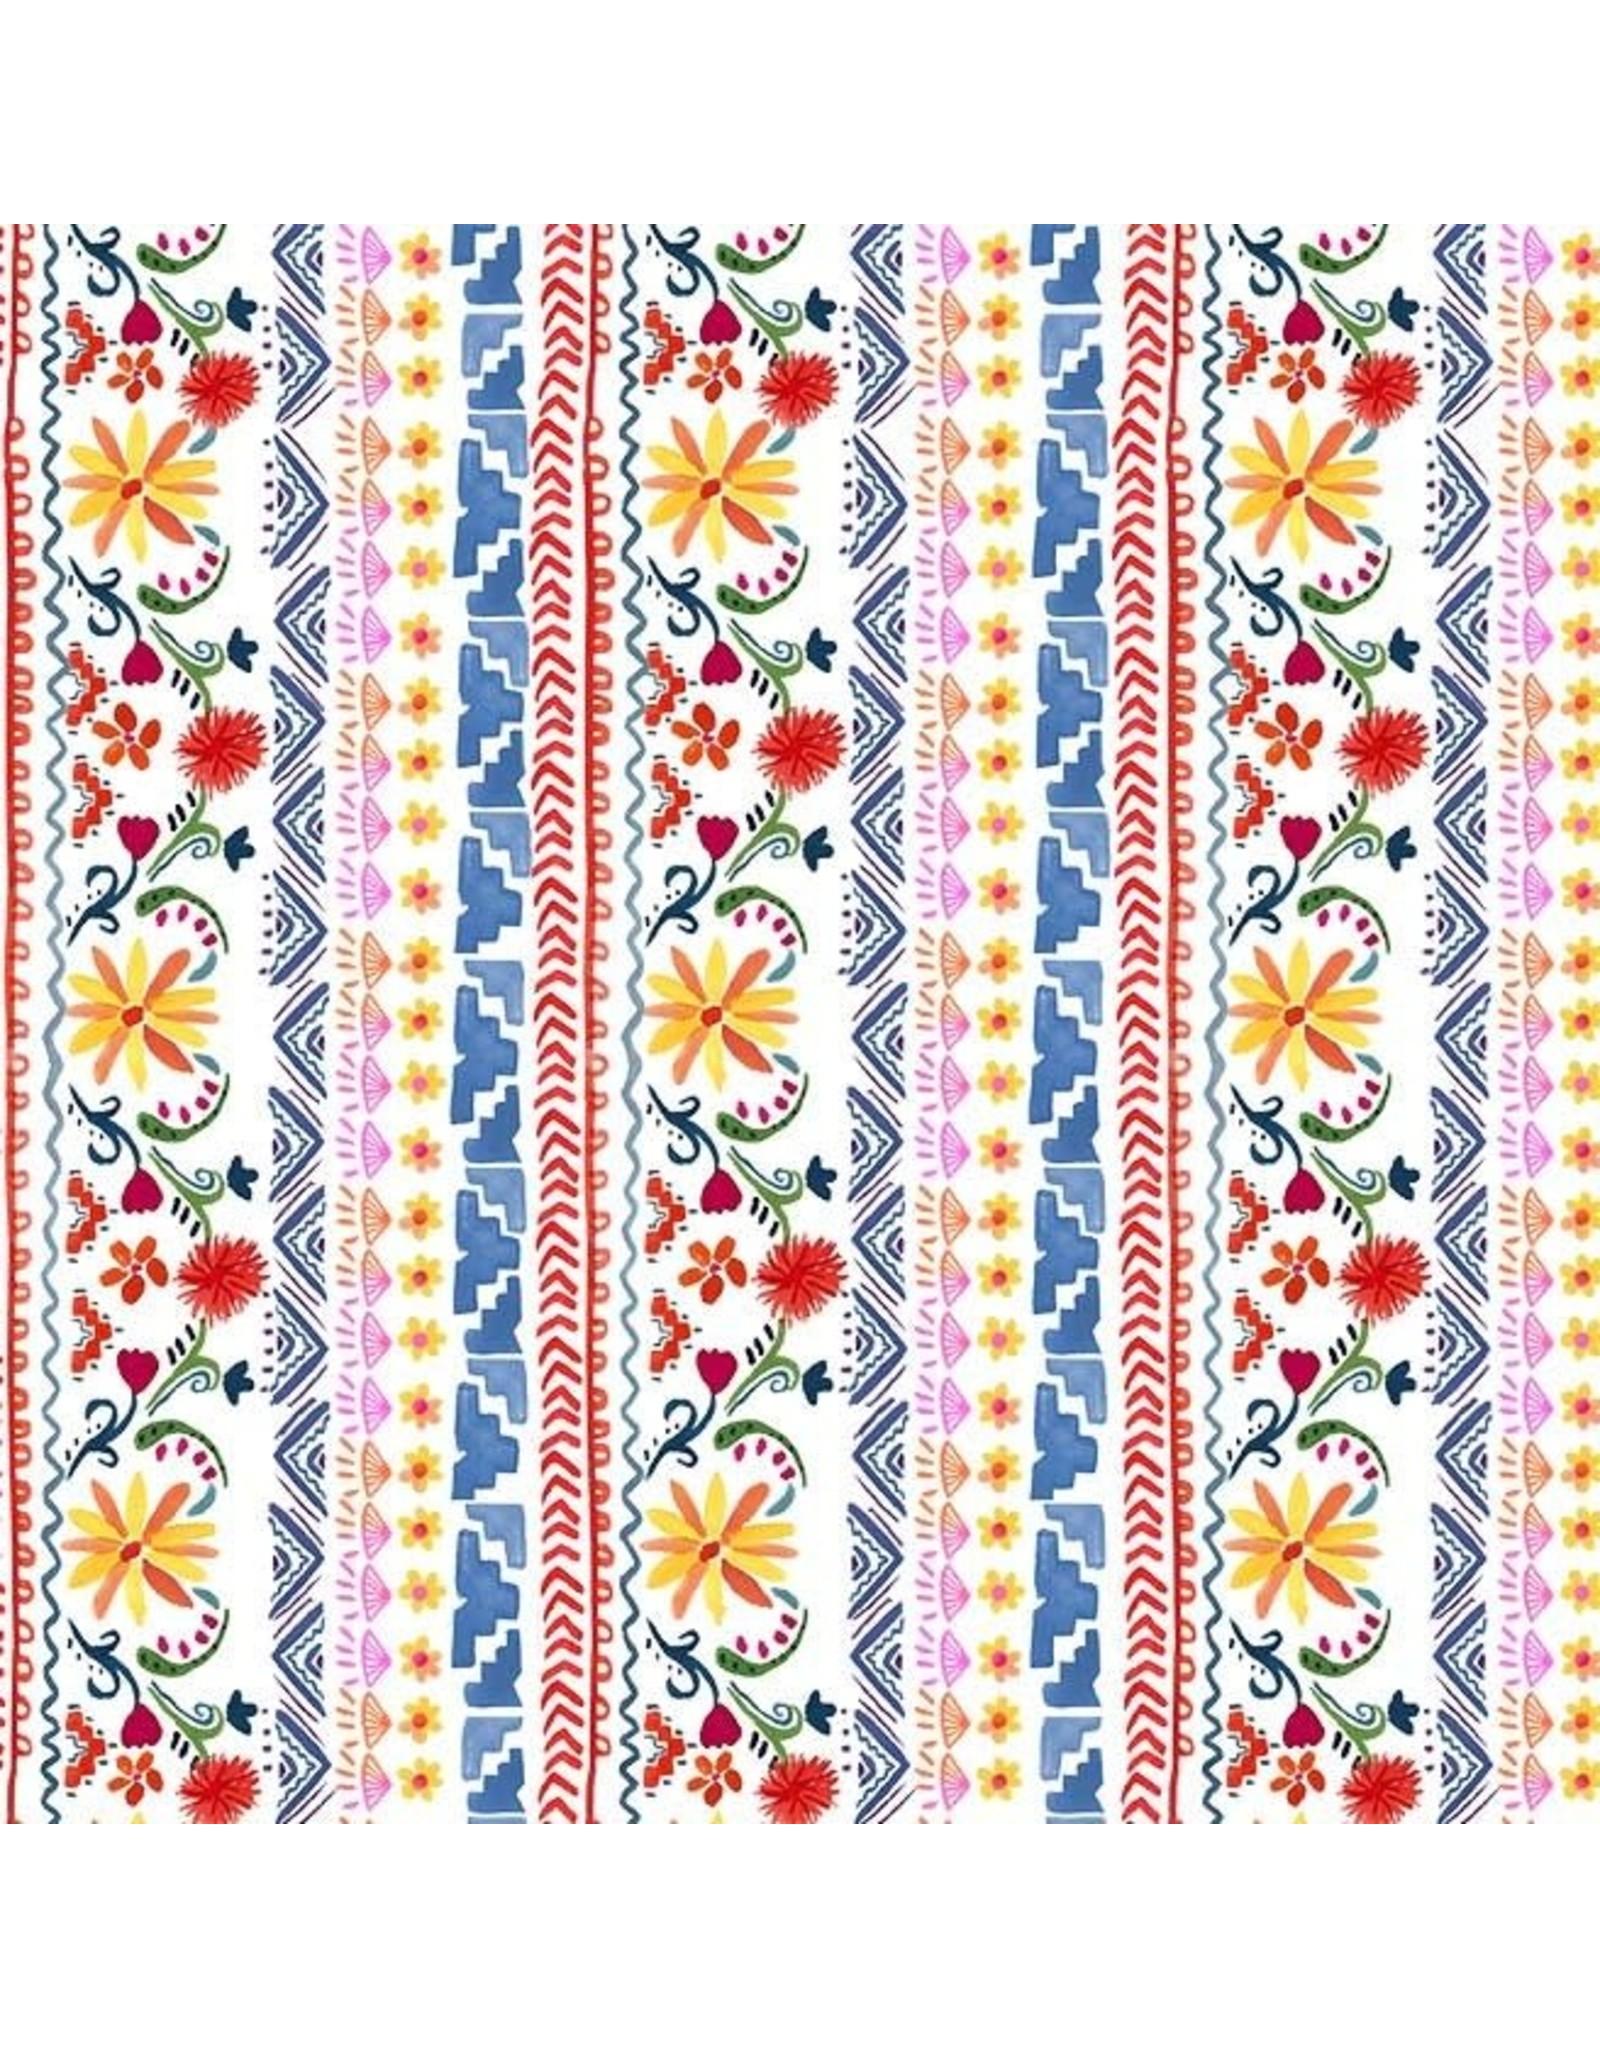 Michael Miller La Vida Loca, Siesta Stripe in White, Fabric Half-Yards